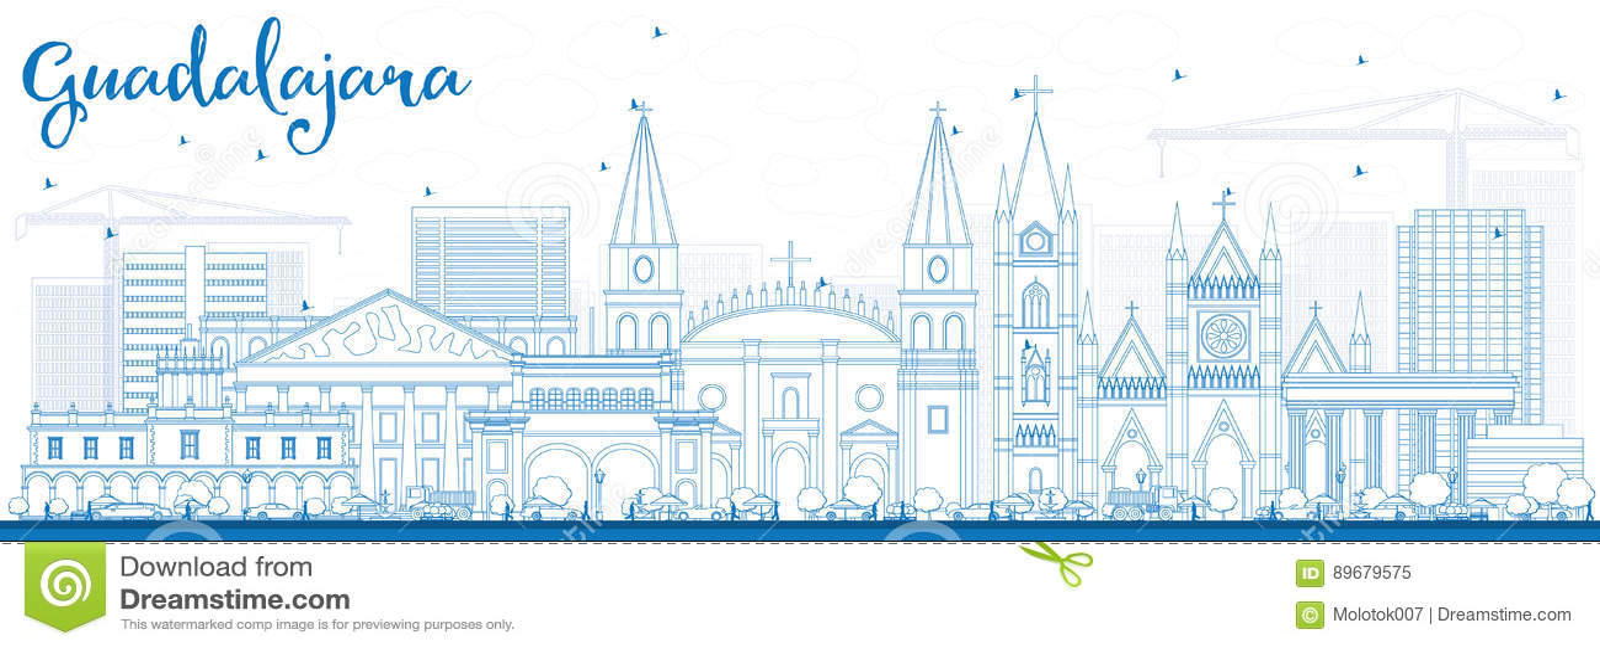 Konturu Guadalajara linia horyzontu z Błękitnymi budynkami